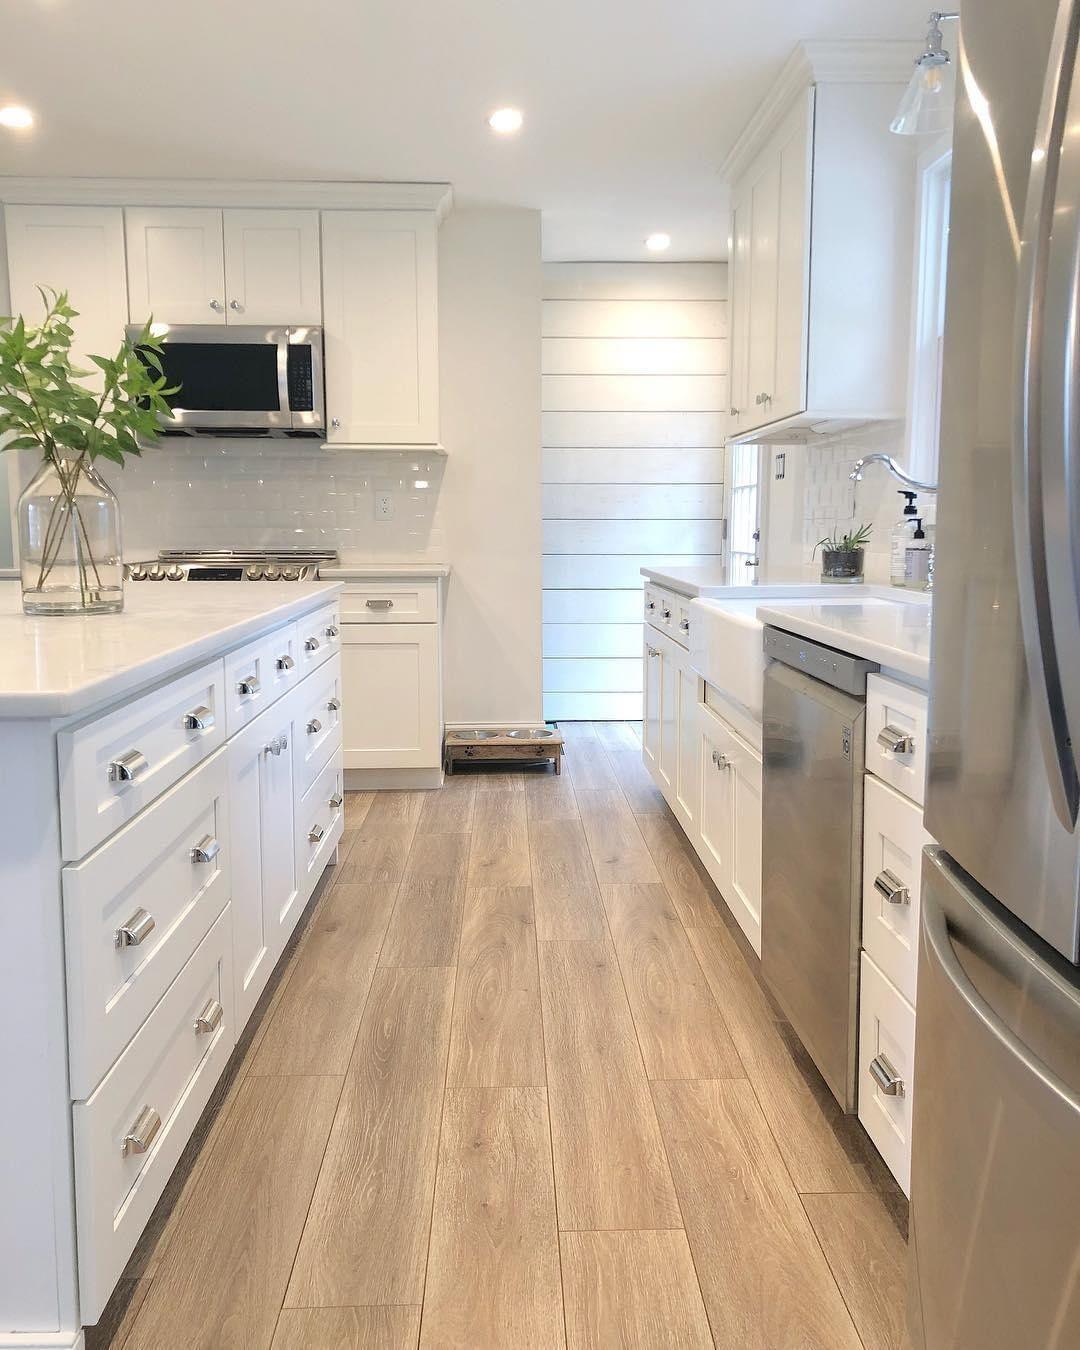 Floor Decor On Instagram Raise A Glass Of Orange Juice For Kitchens That Have Gorgeous Hardwood Floors Fi Home Decor Kitchen Kitchen Design Kitchen Decor